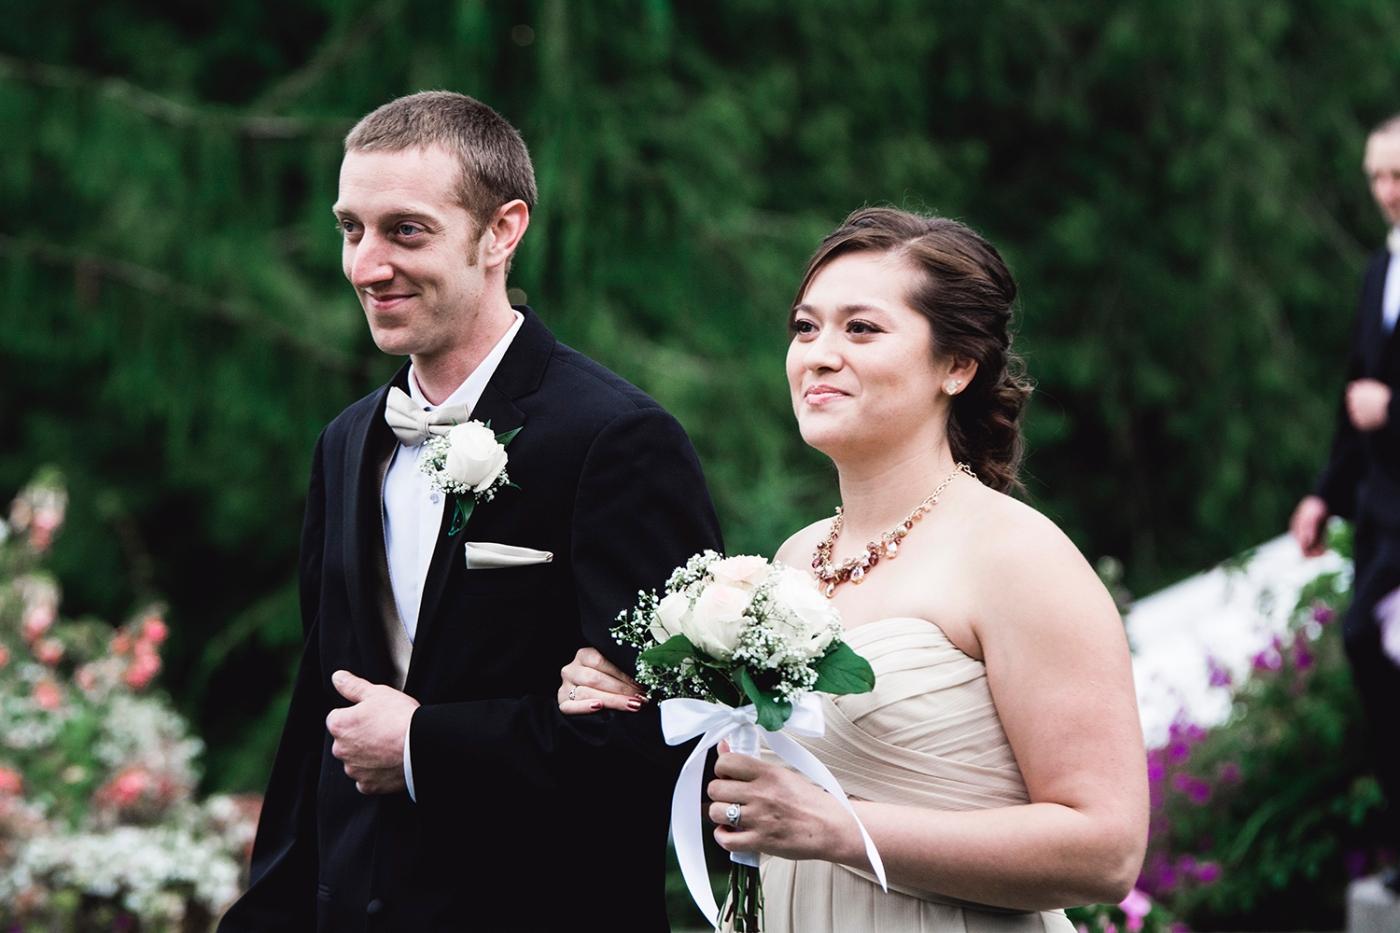 Jane_Speleers_2016_Details_Wedding_Wild_Rose_Estates_Venue_JS7_7732